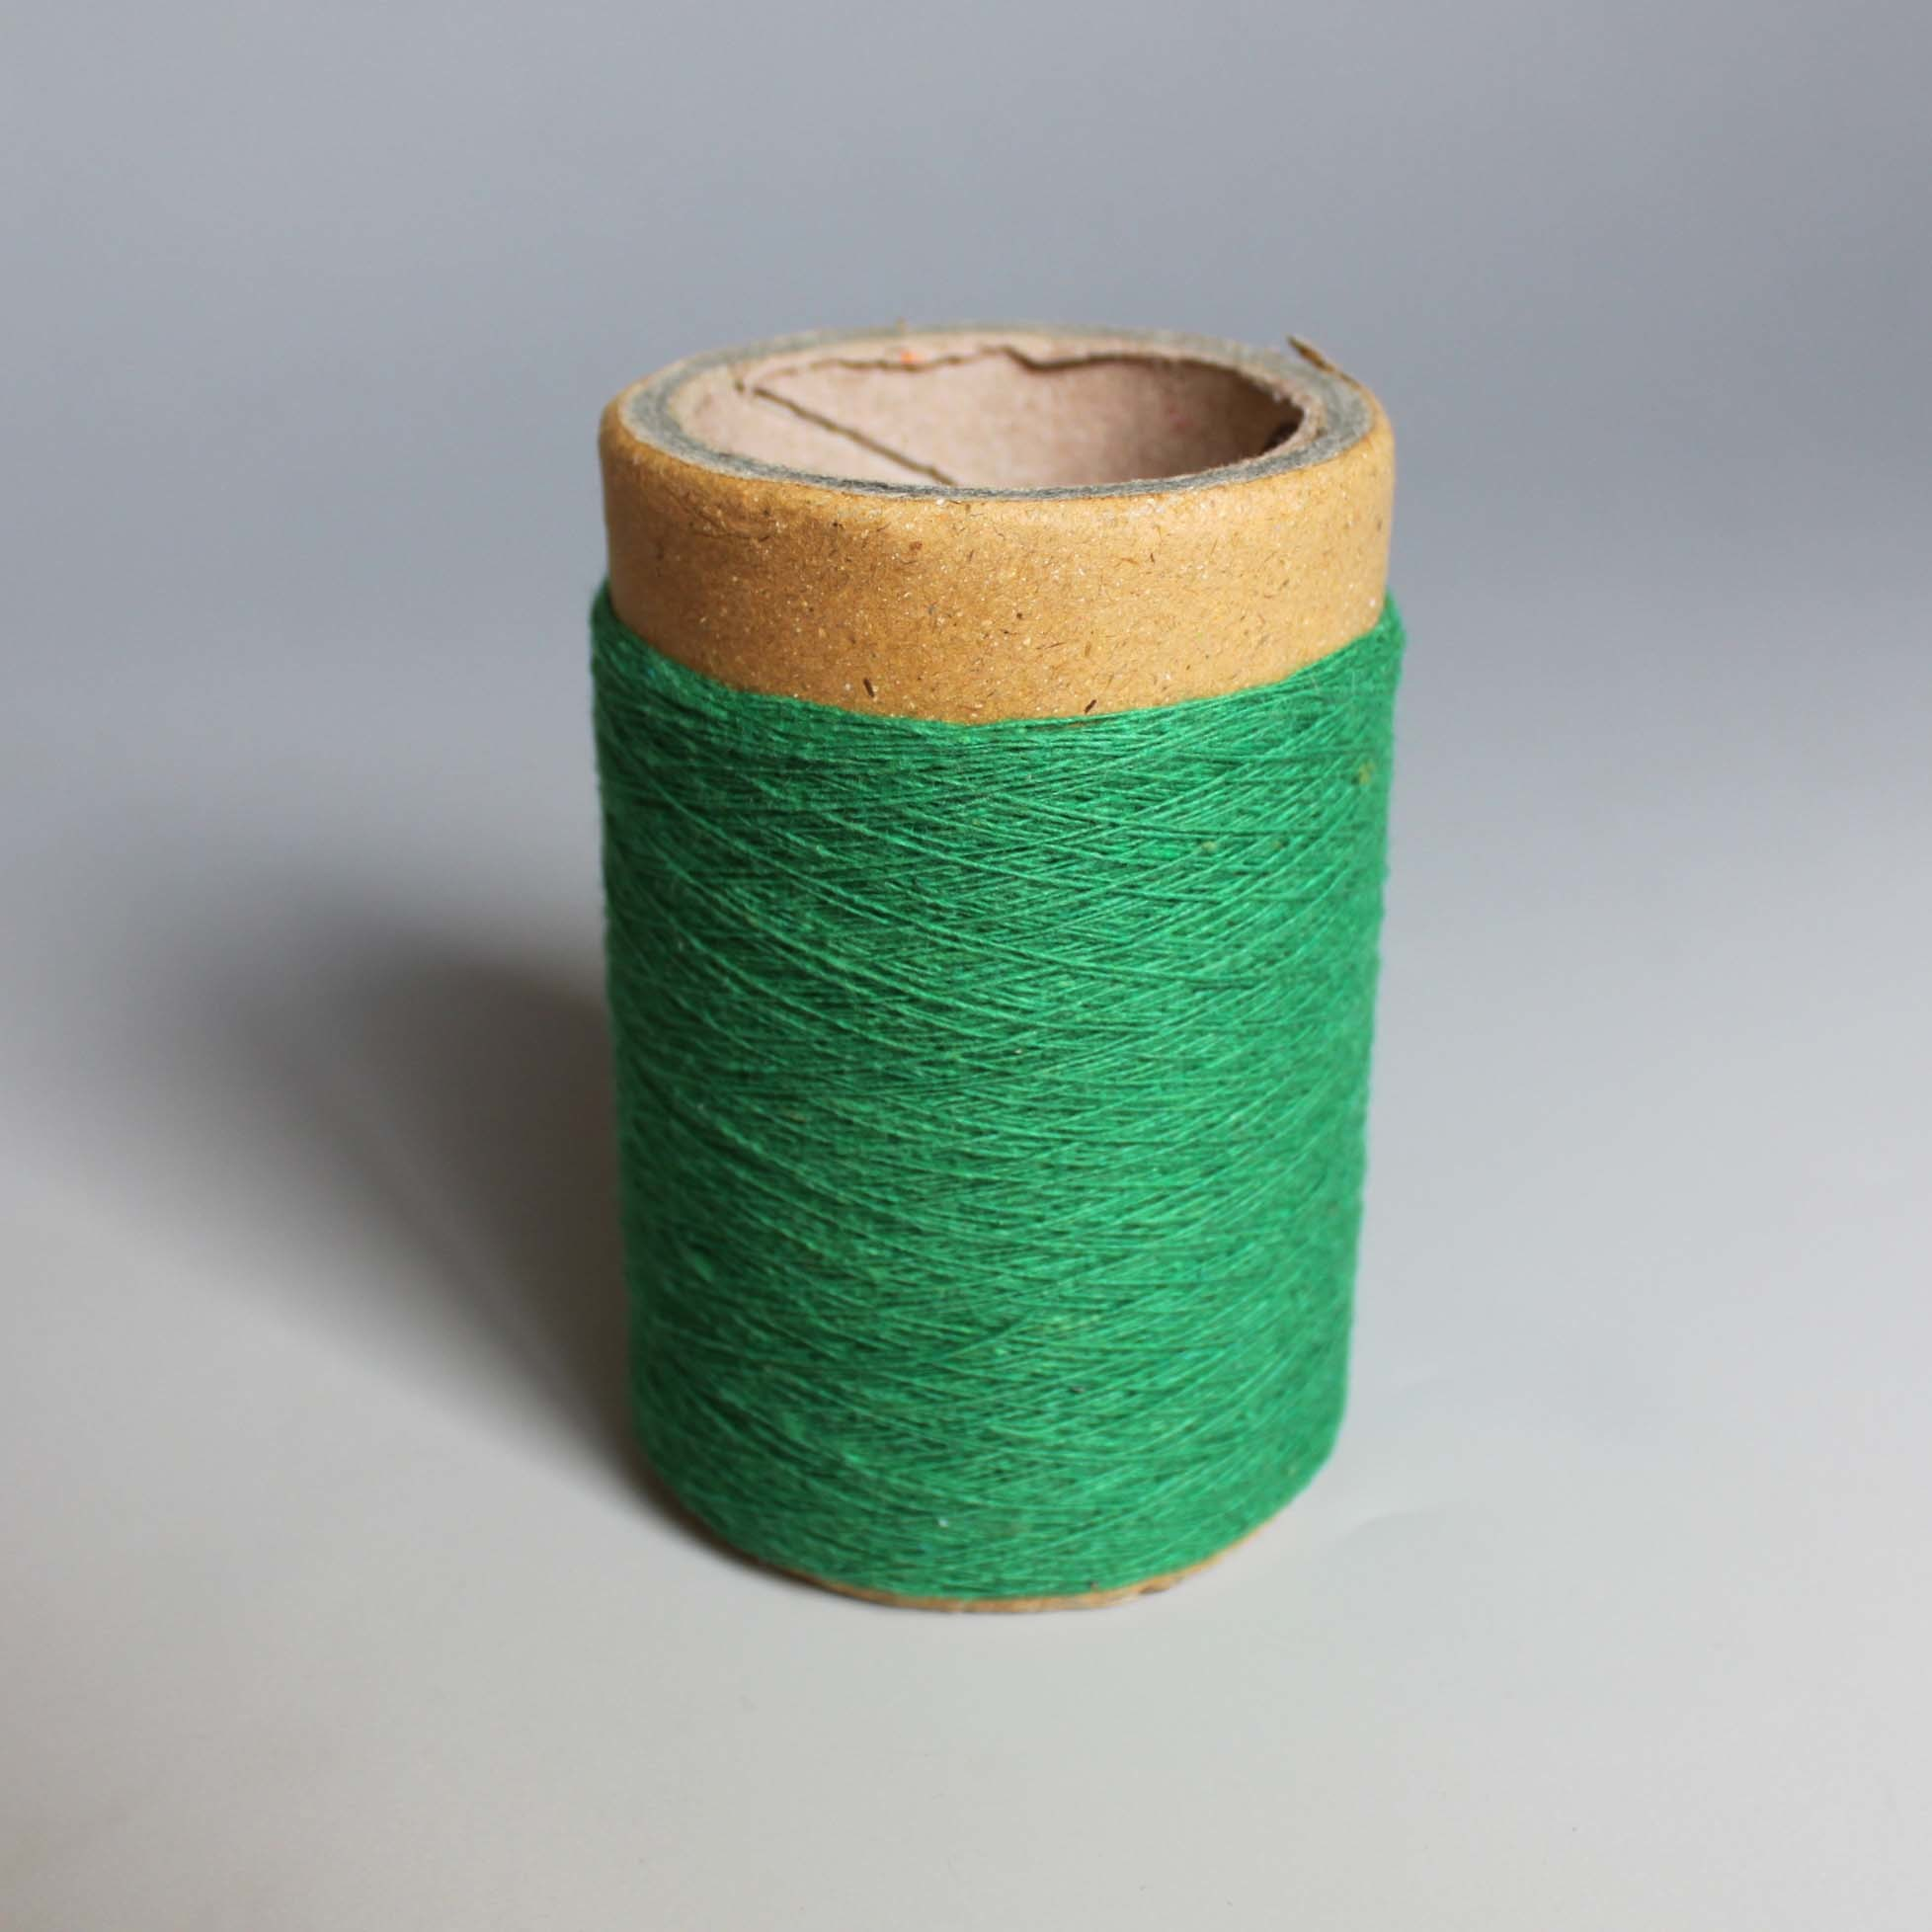 Hot Sell Spun Polyester Yarn / Spandex Covered Yarn Free